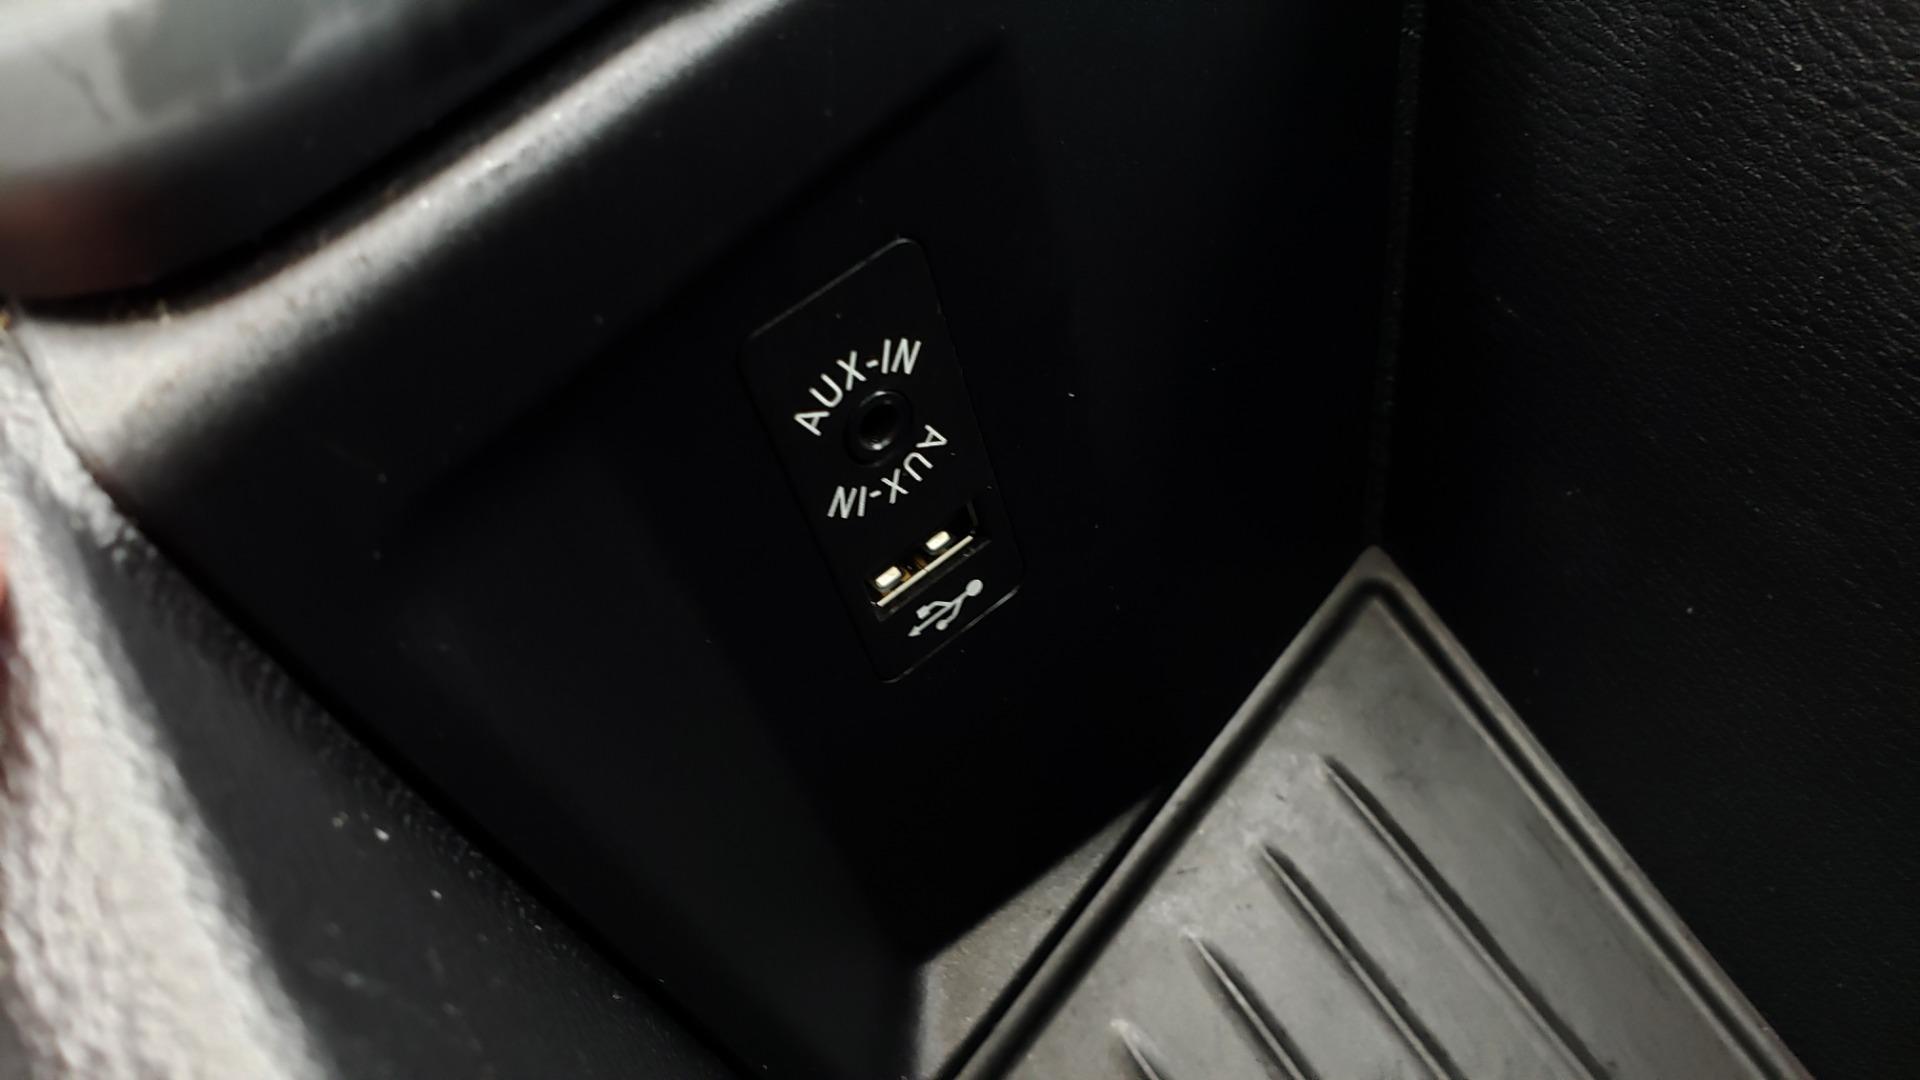 Used 2017 BMW X1 XDRIVE28I / PREM PKG / DRIVER ASST / NAV / CLD WTHR for sale Sold at Formula Imports in Charlotte NC 28227 60